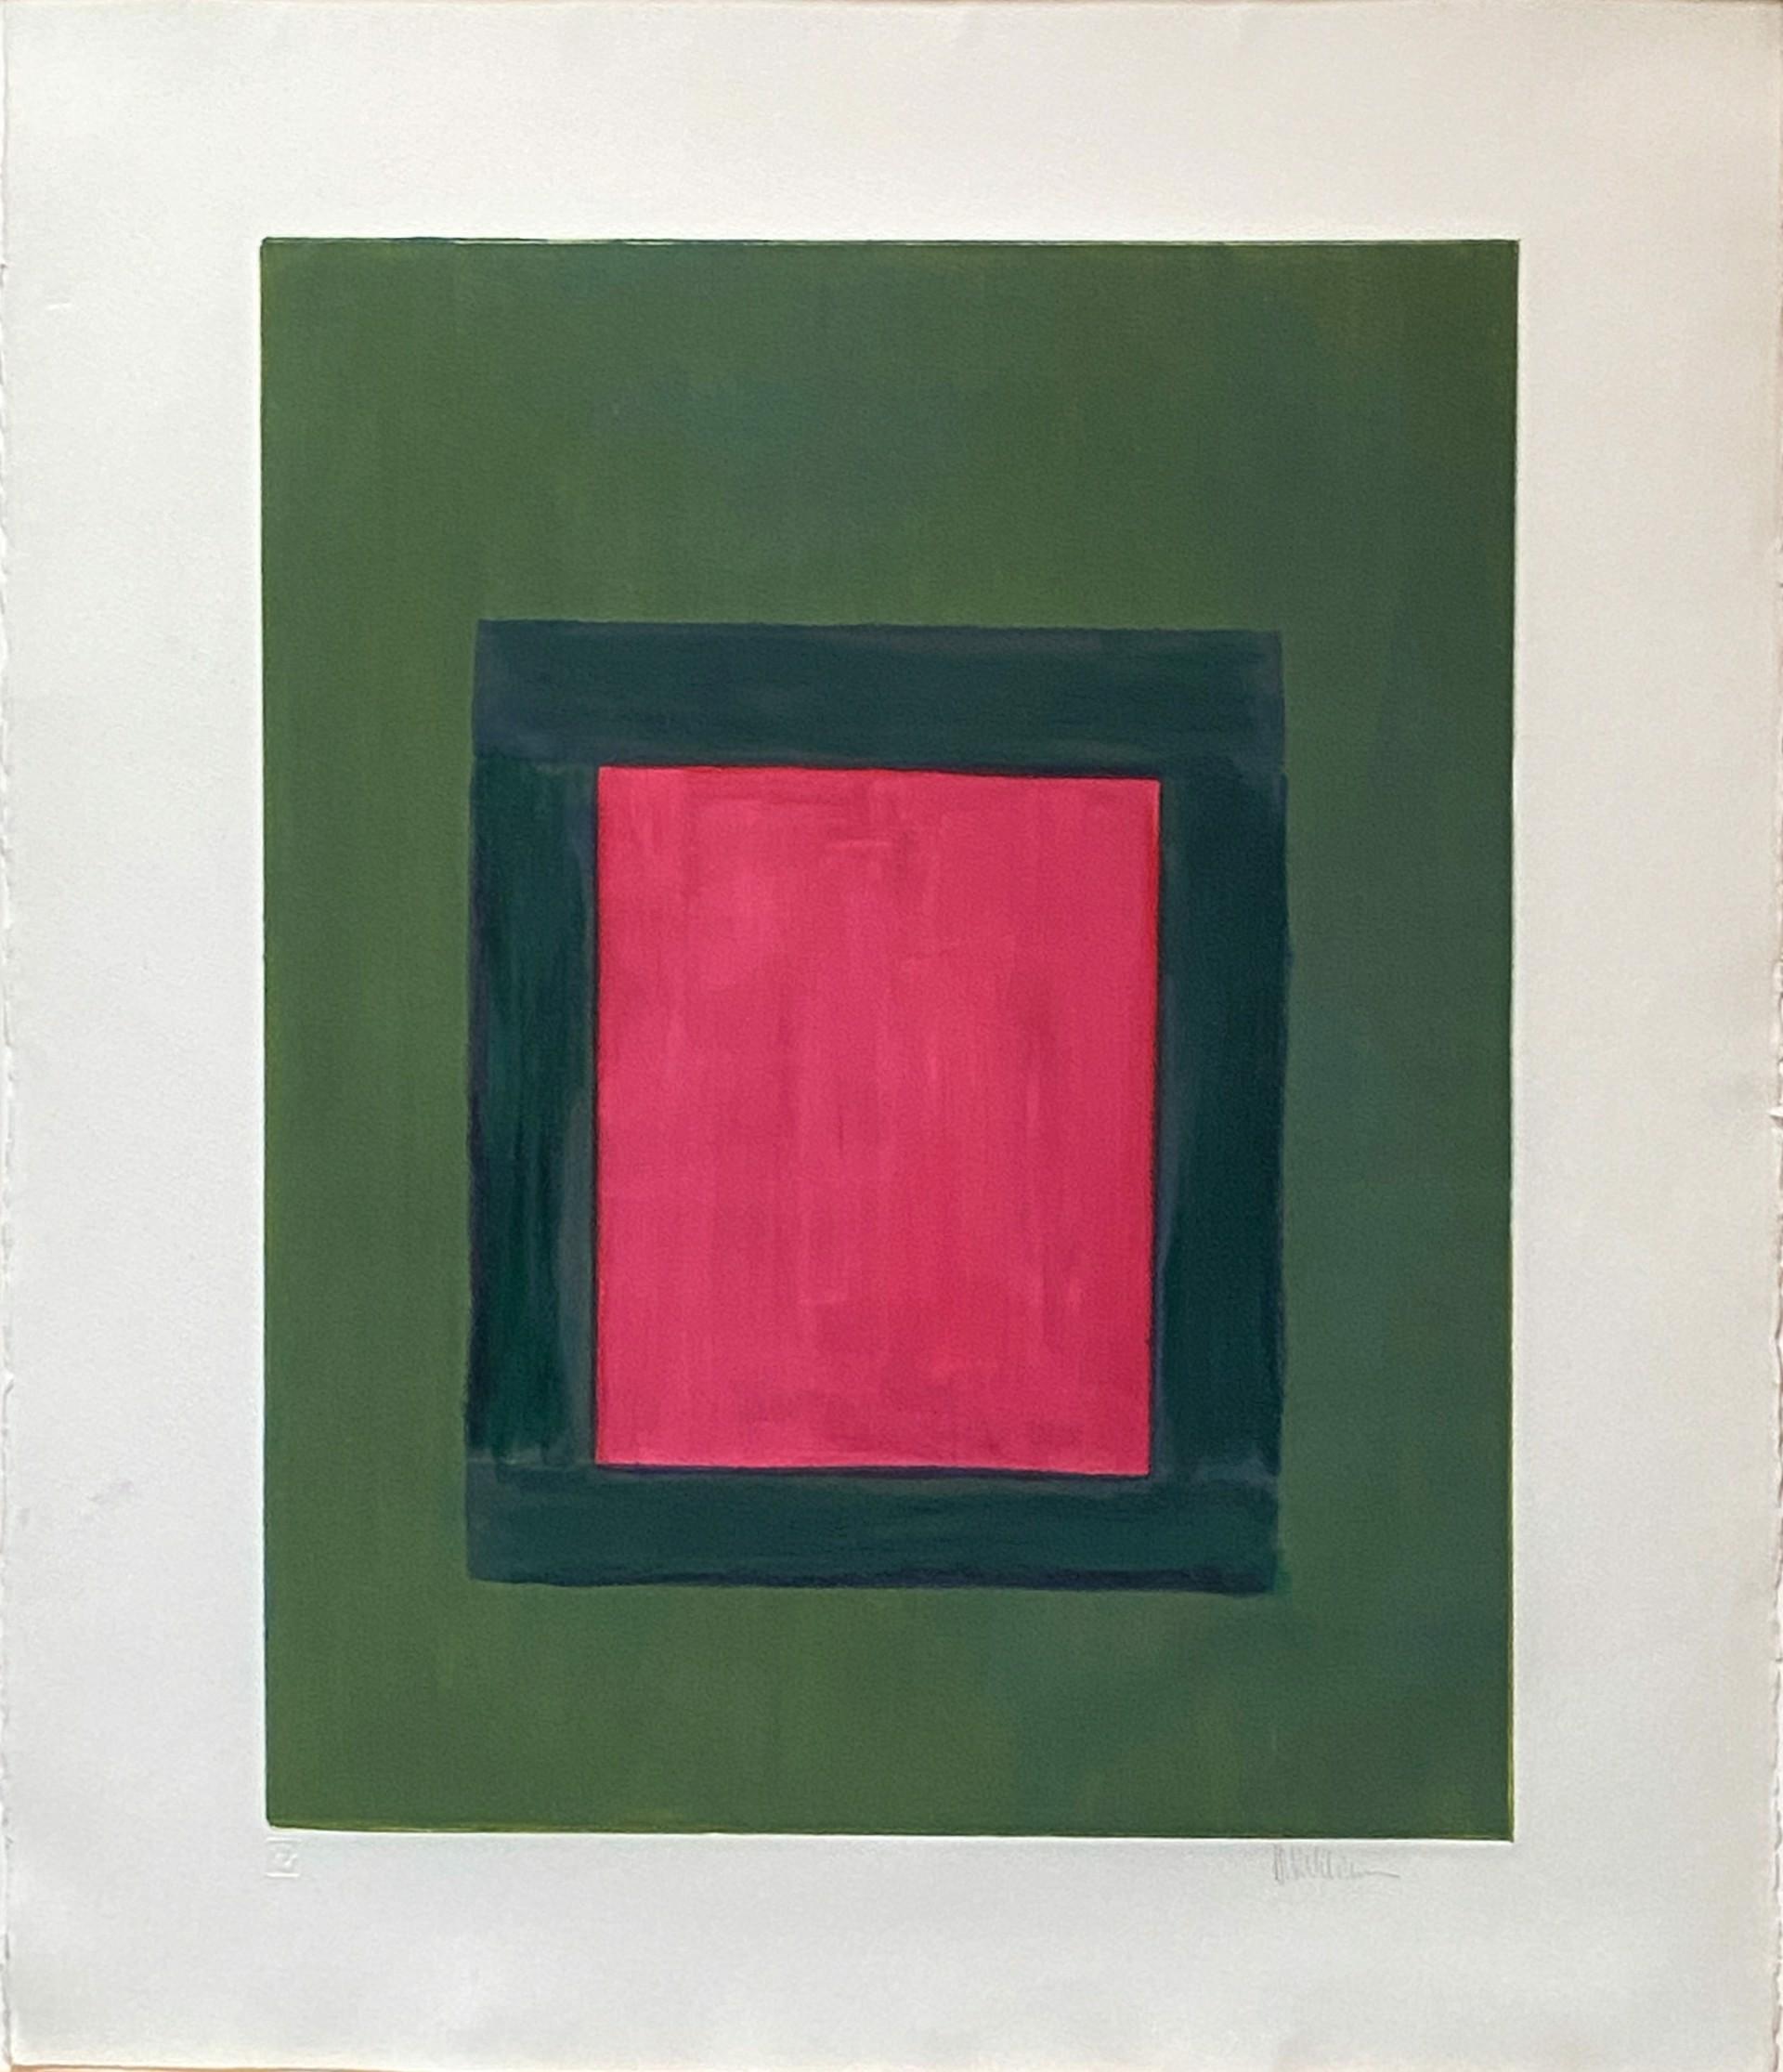 Rose on Green Window by Harold Waldrum